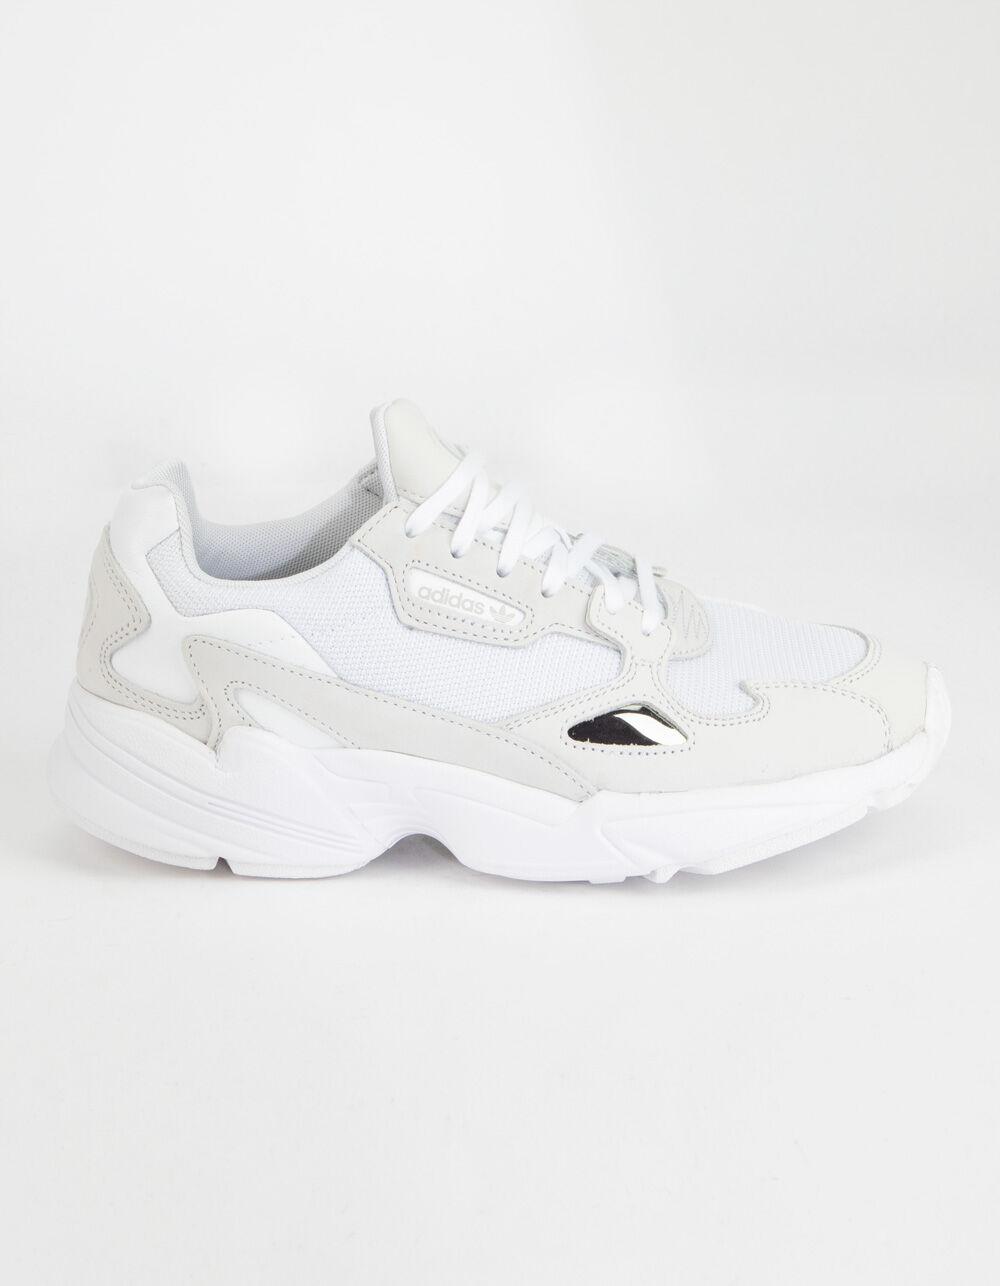 ADIDAS Falcon White Shoes